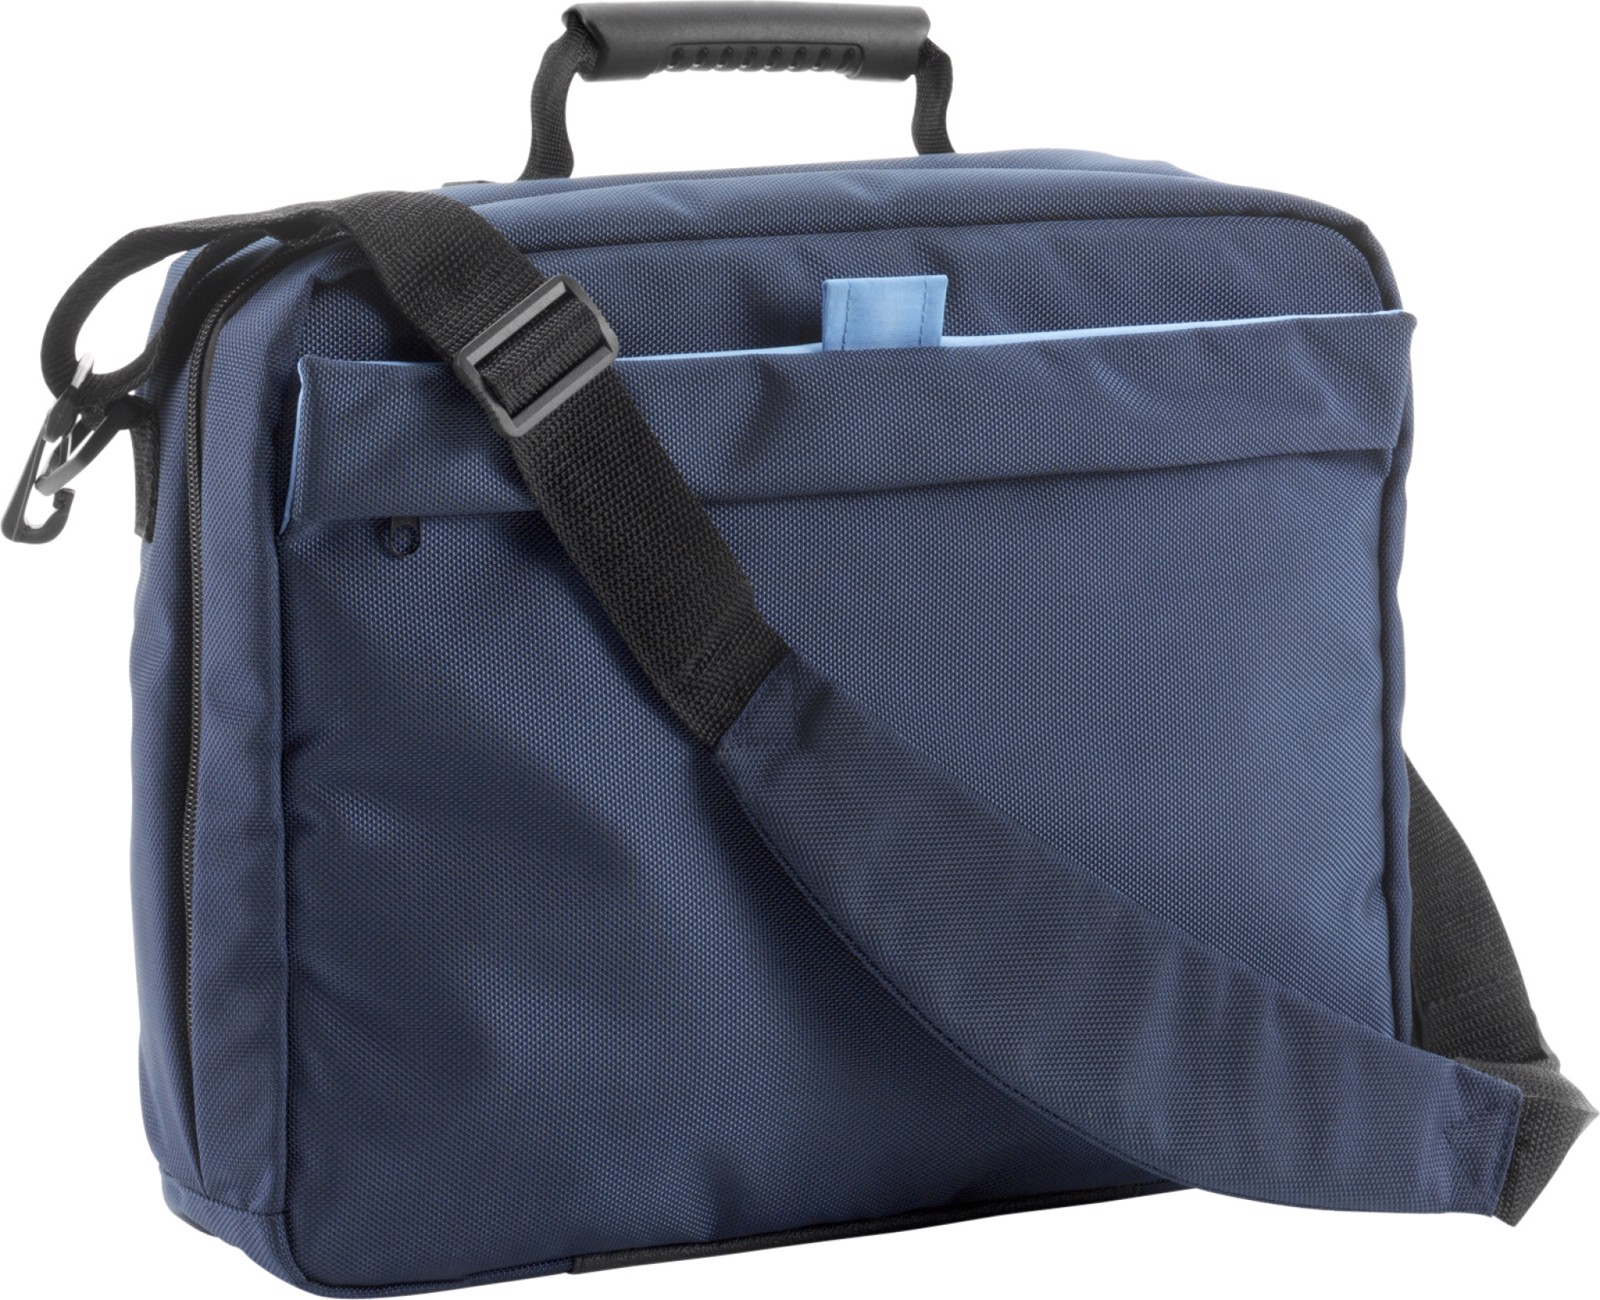 Polyester (1680D) laptop bag - Blue